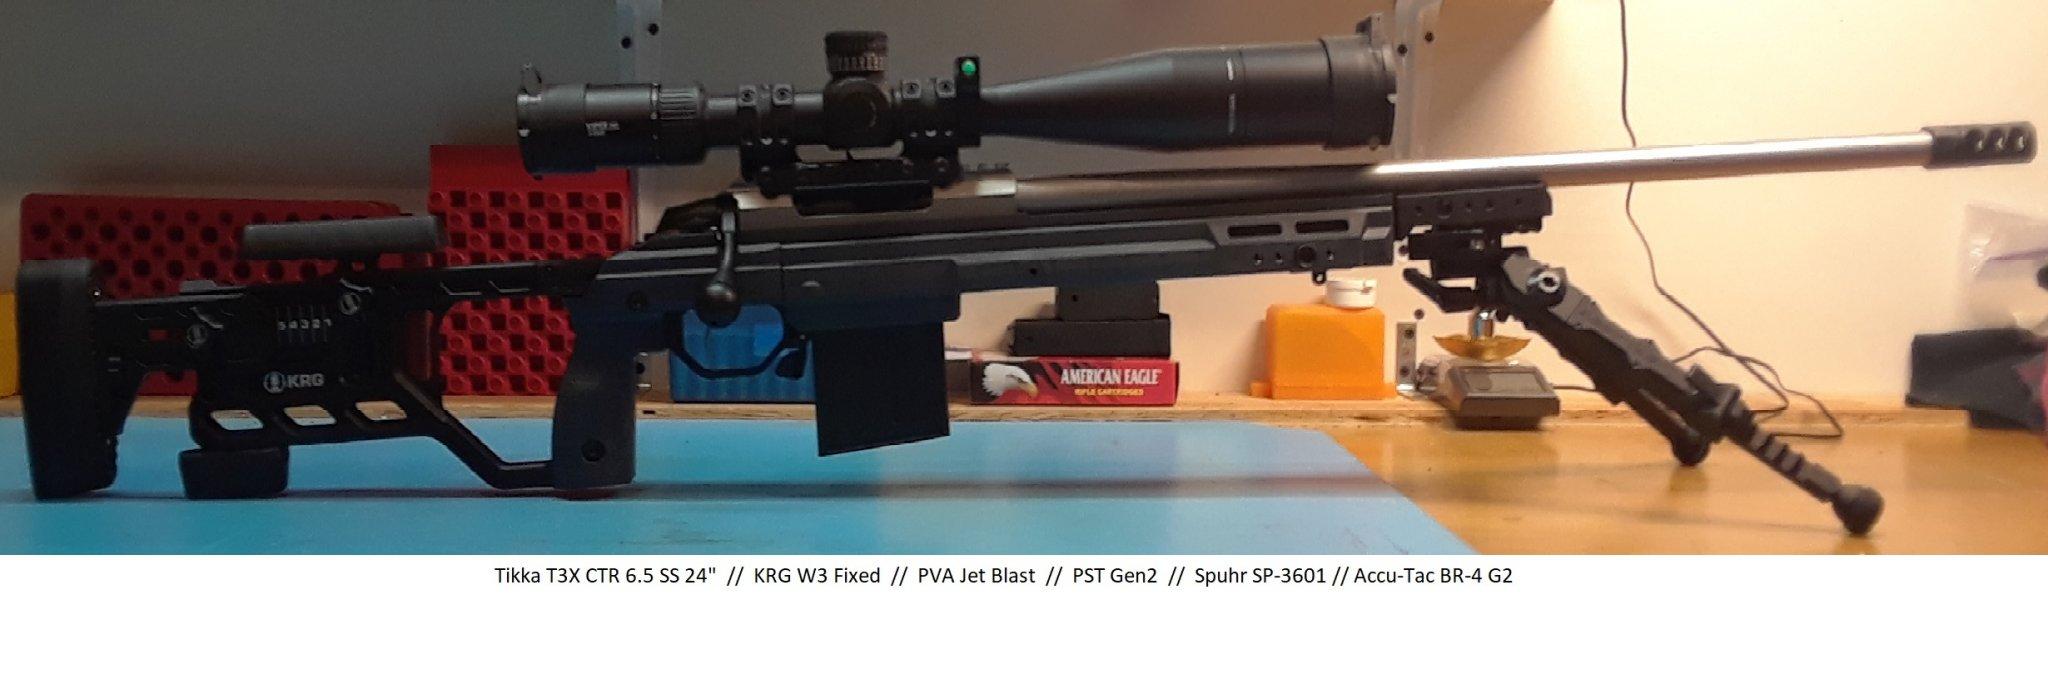 RifleCropped.jpg